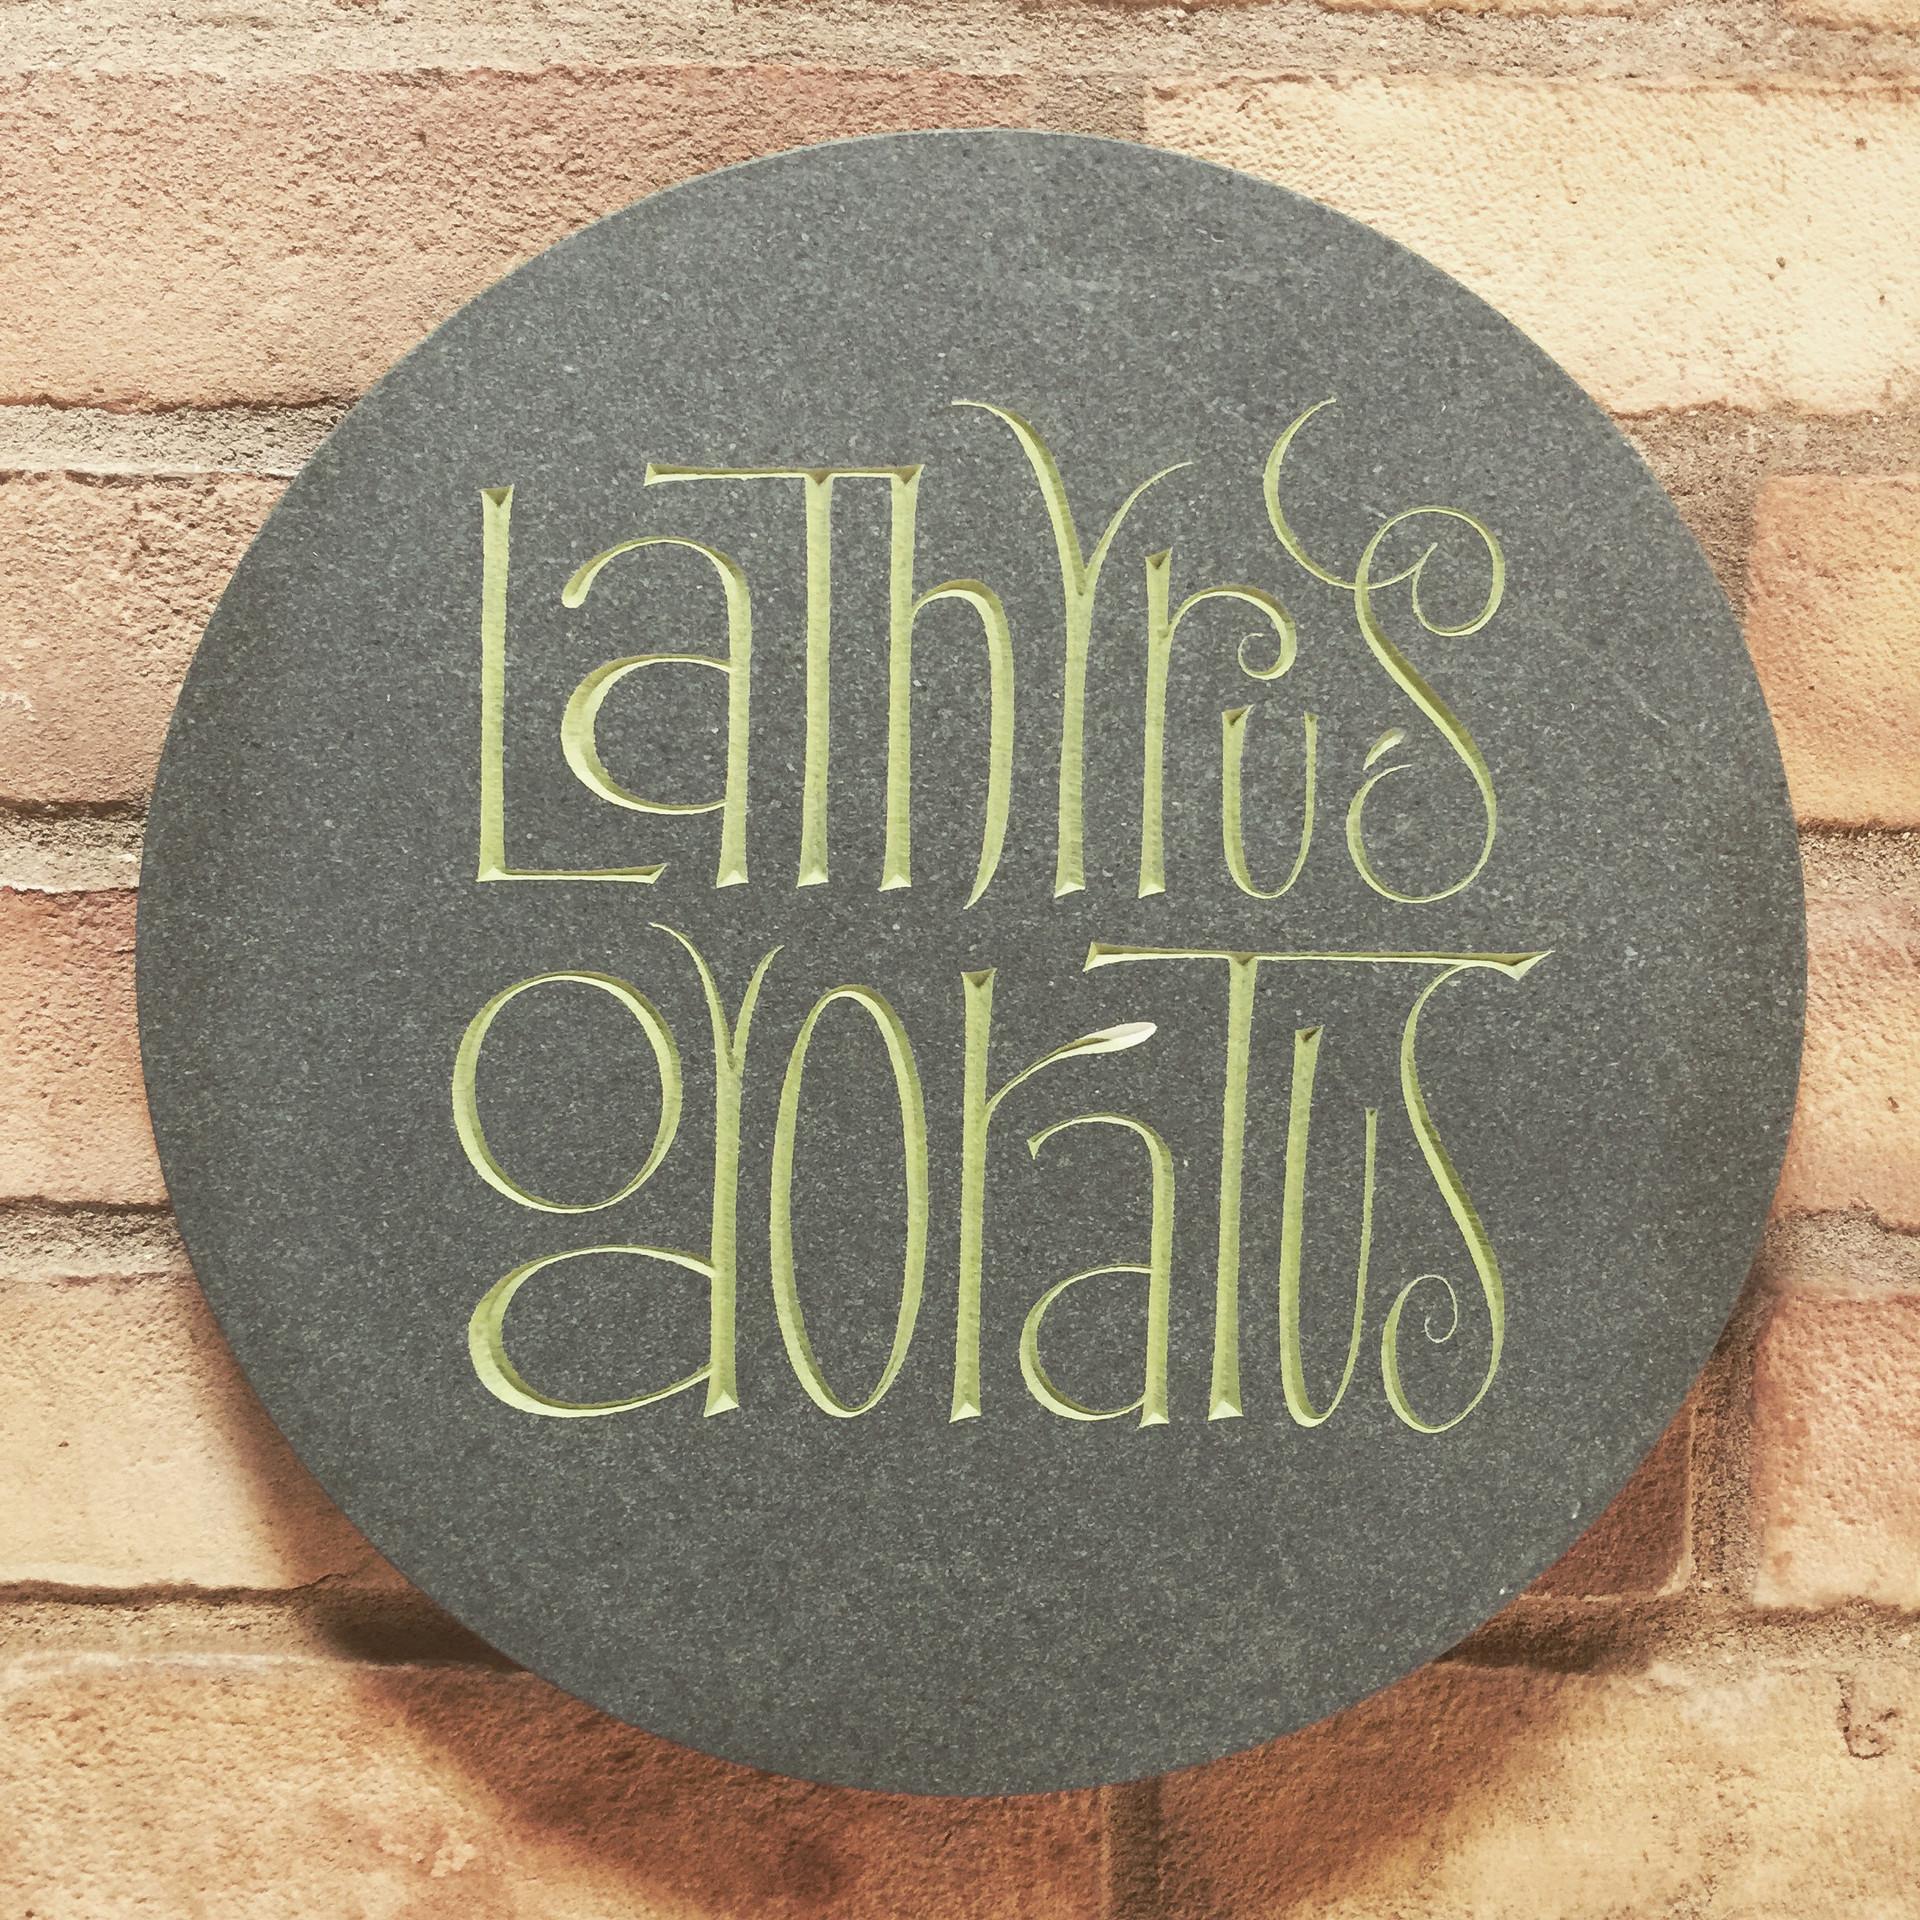 Lathyrus Odoratus (Sweet Pea in Latin)